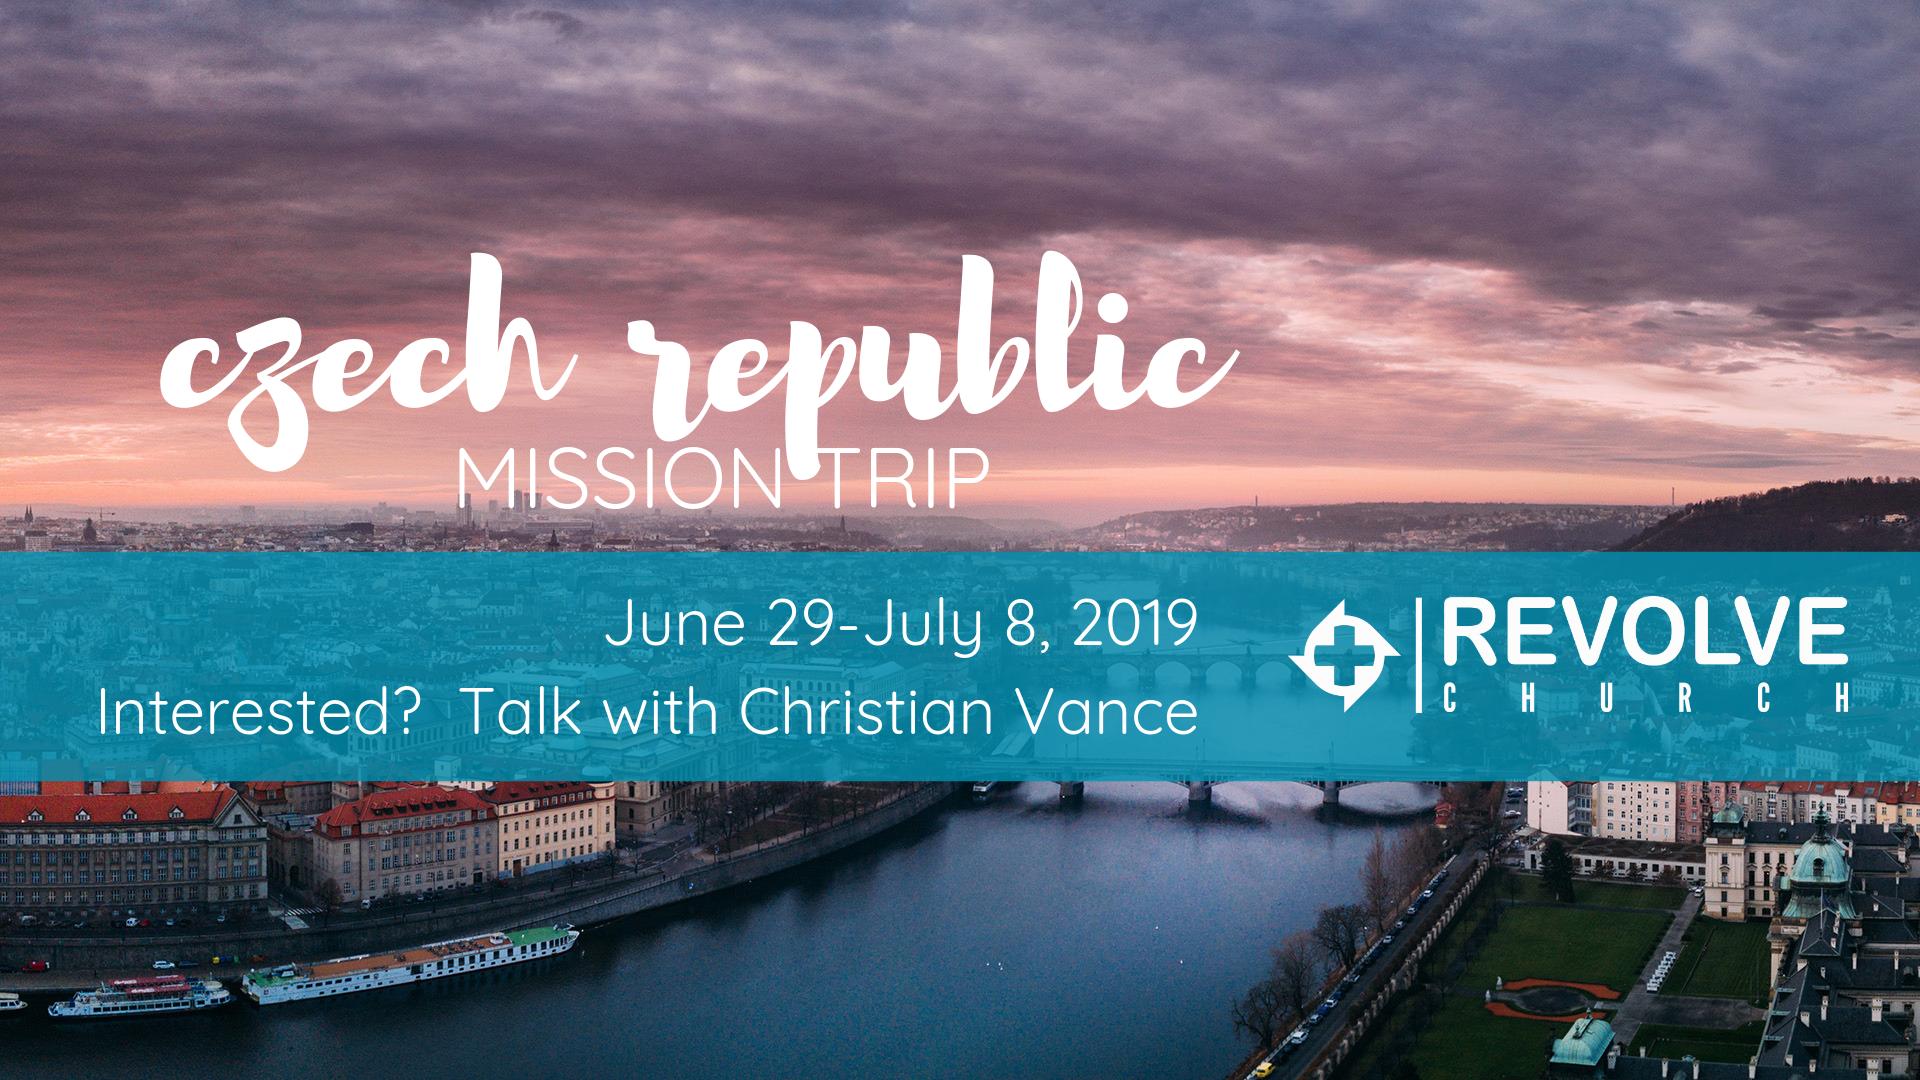 Czech Missions Slide & FB image